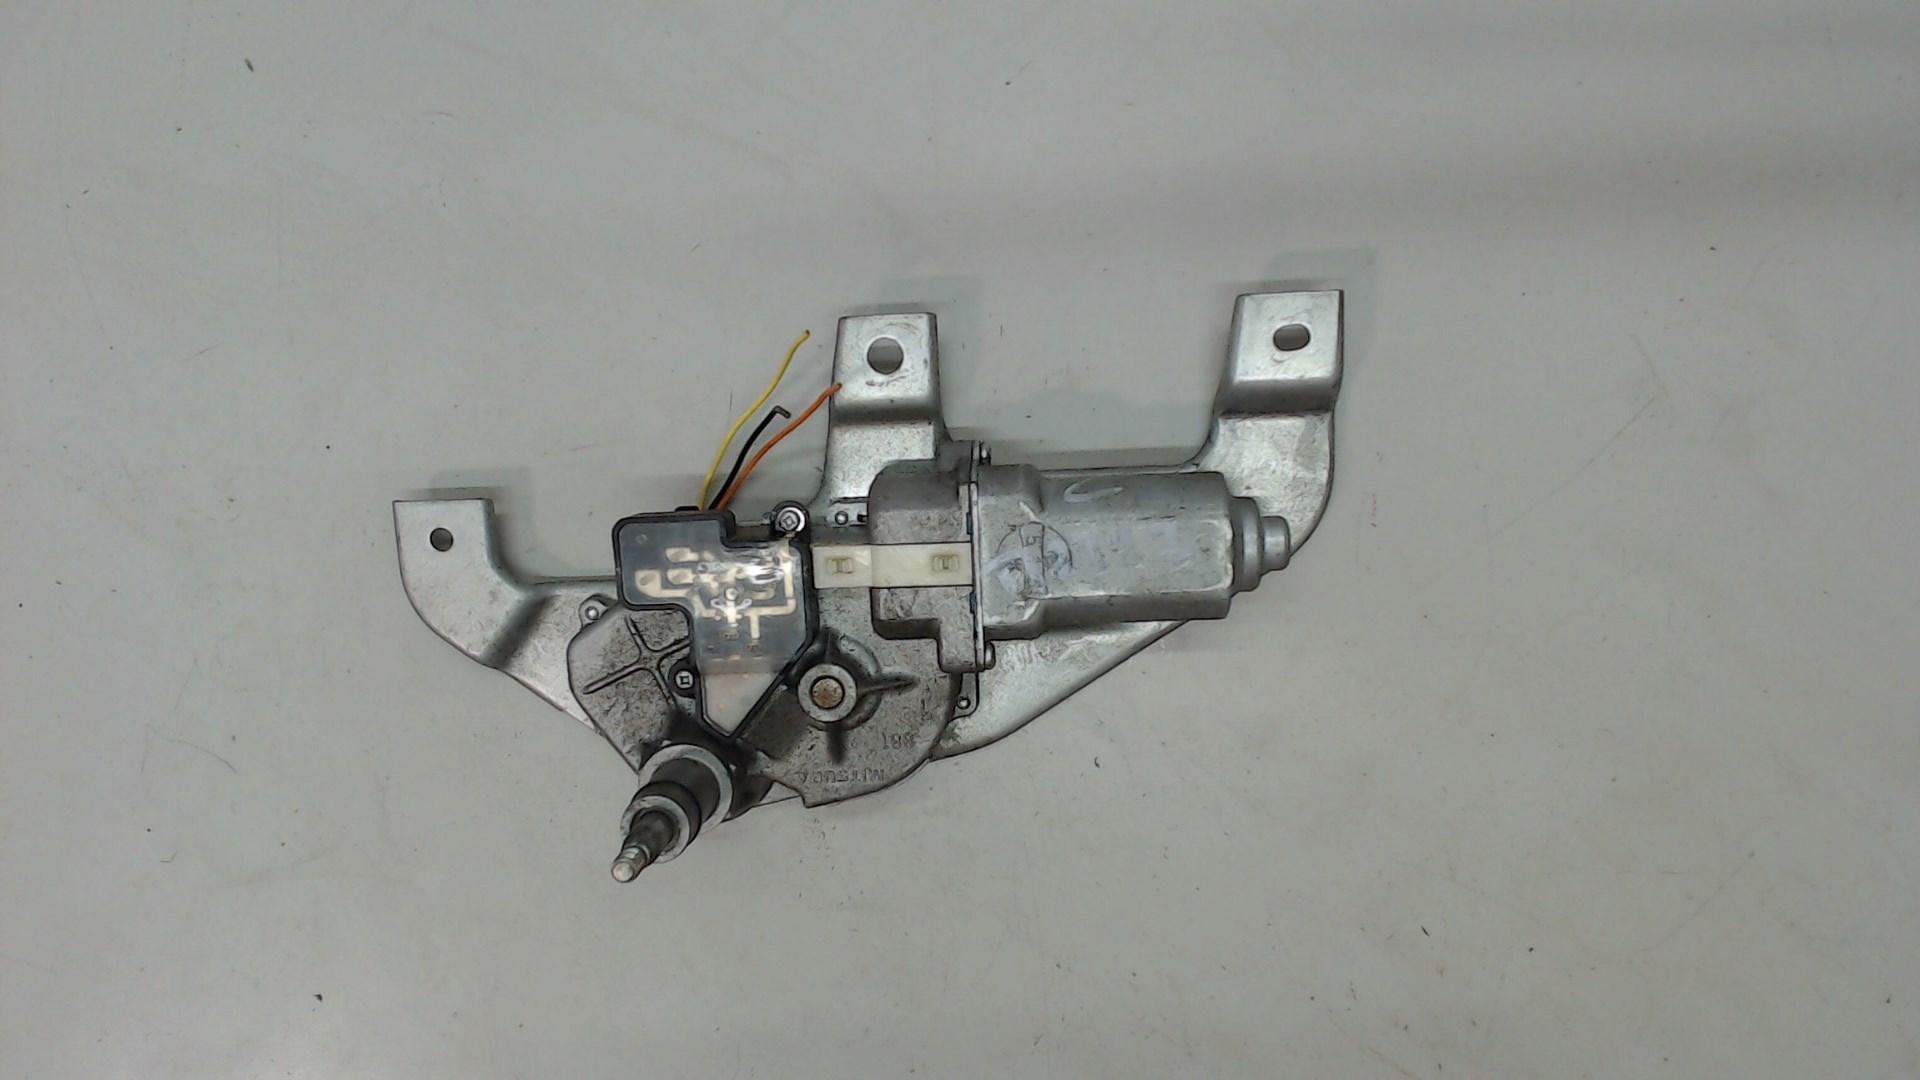 Моторчик заднего стеклоочистителя (дворника) Suzuki Swift 3 3881062J00